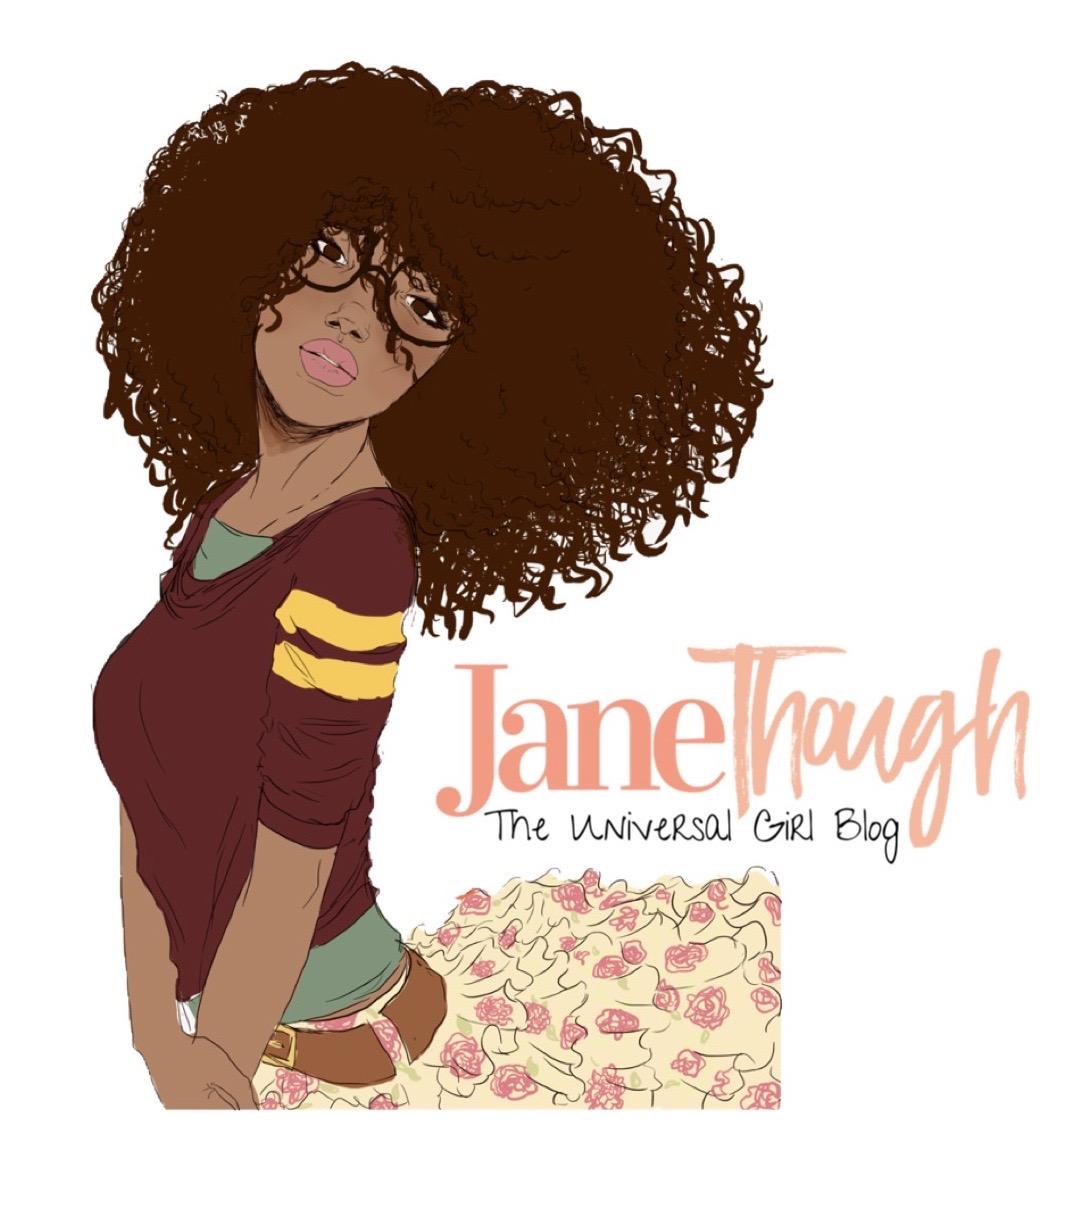 Jane though, a female blog, female lifestyle blog, blog for women